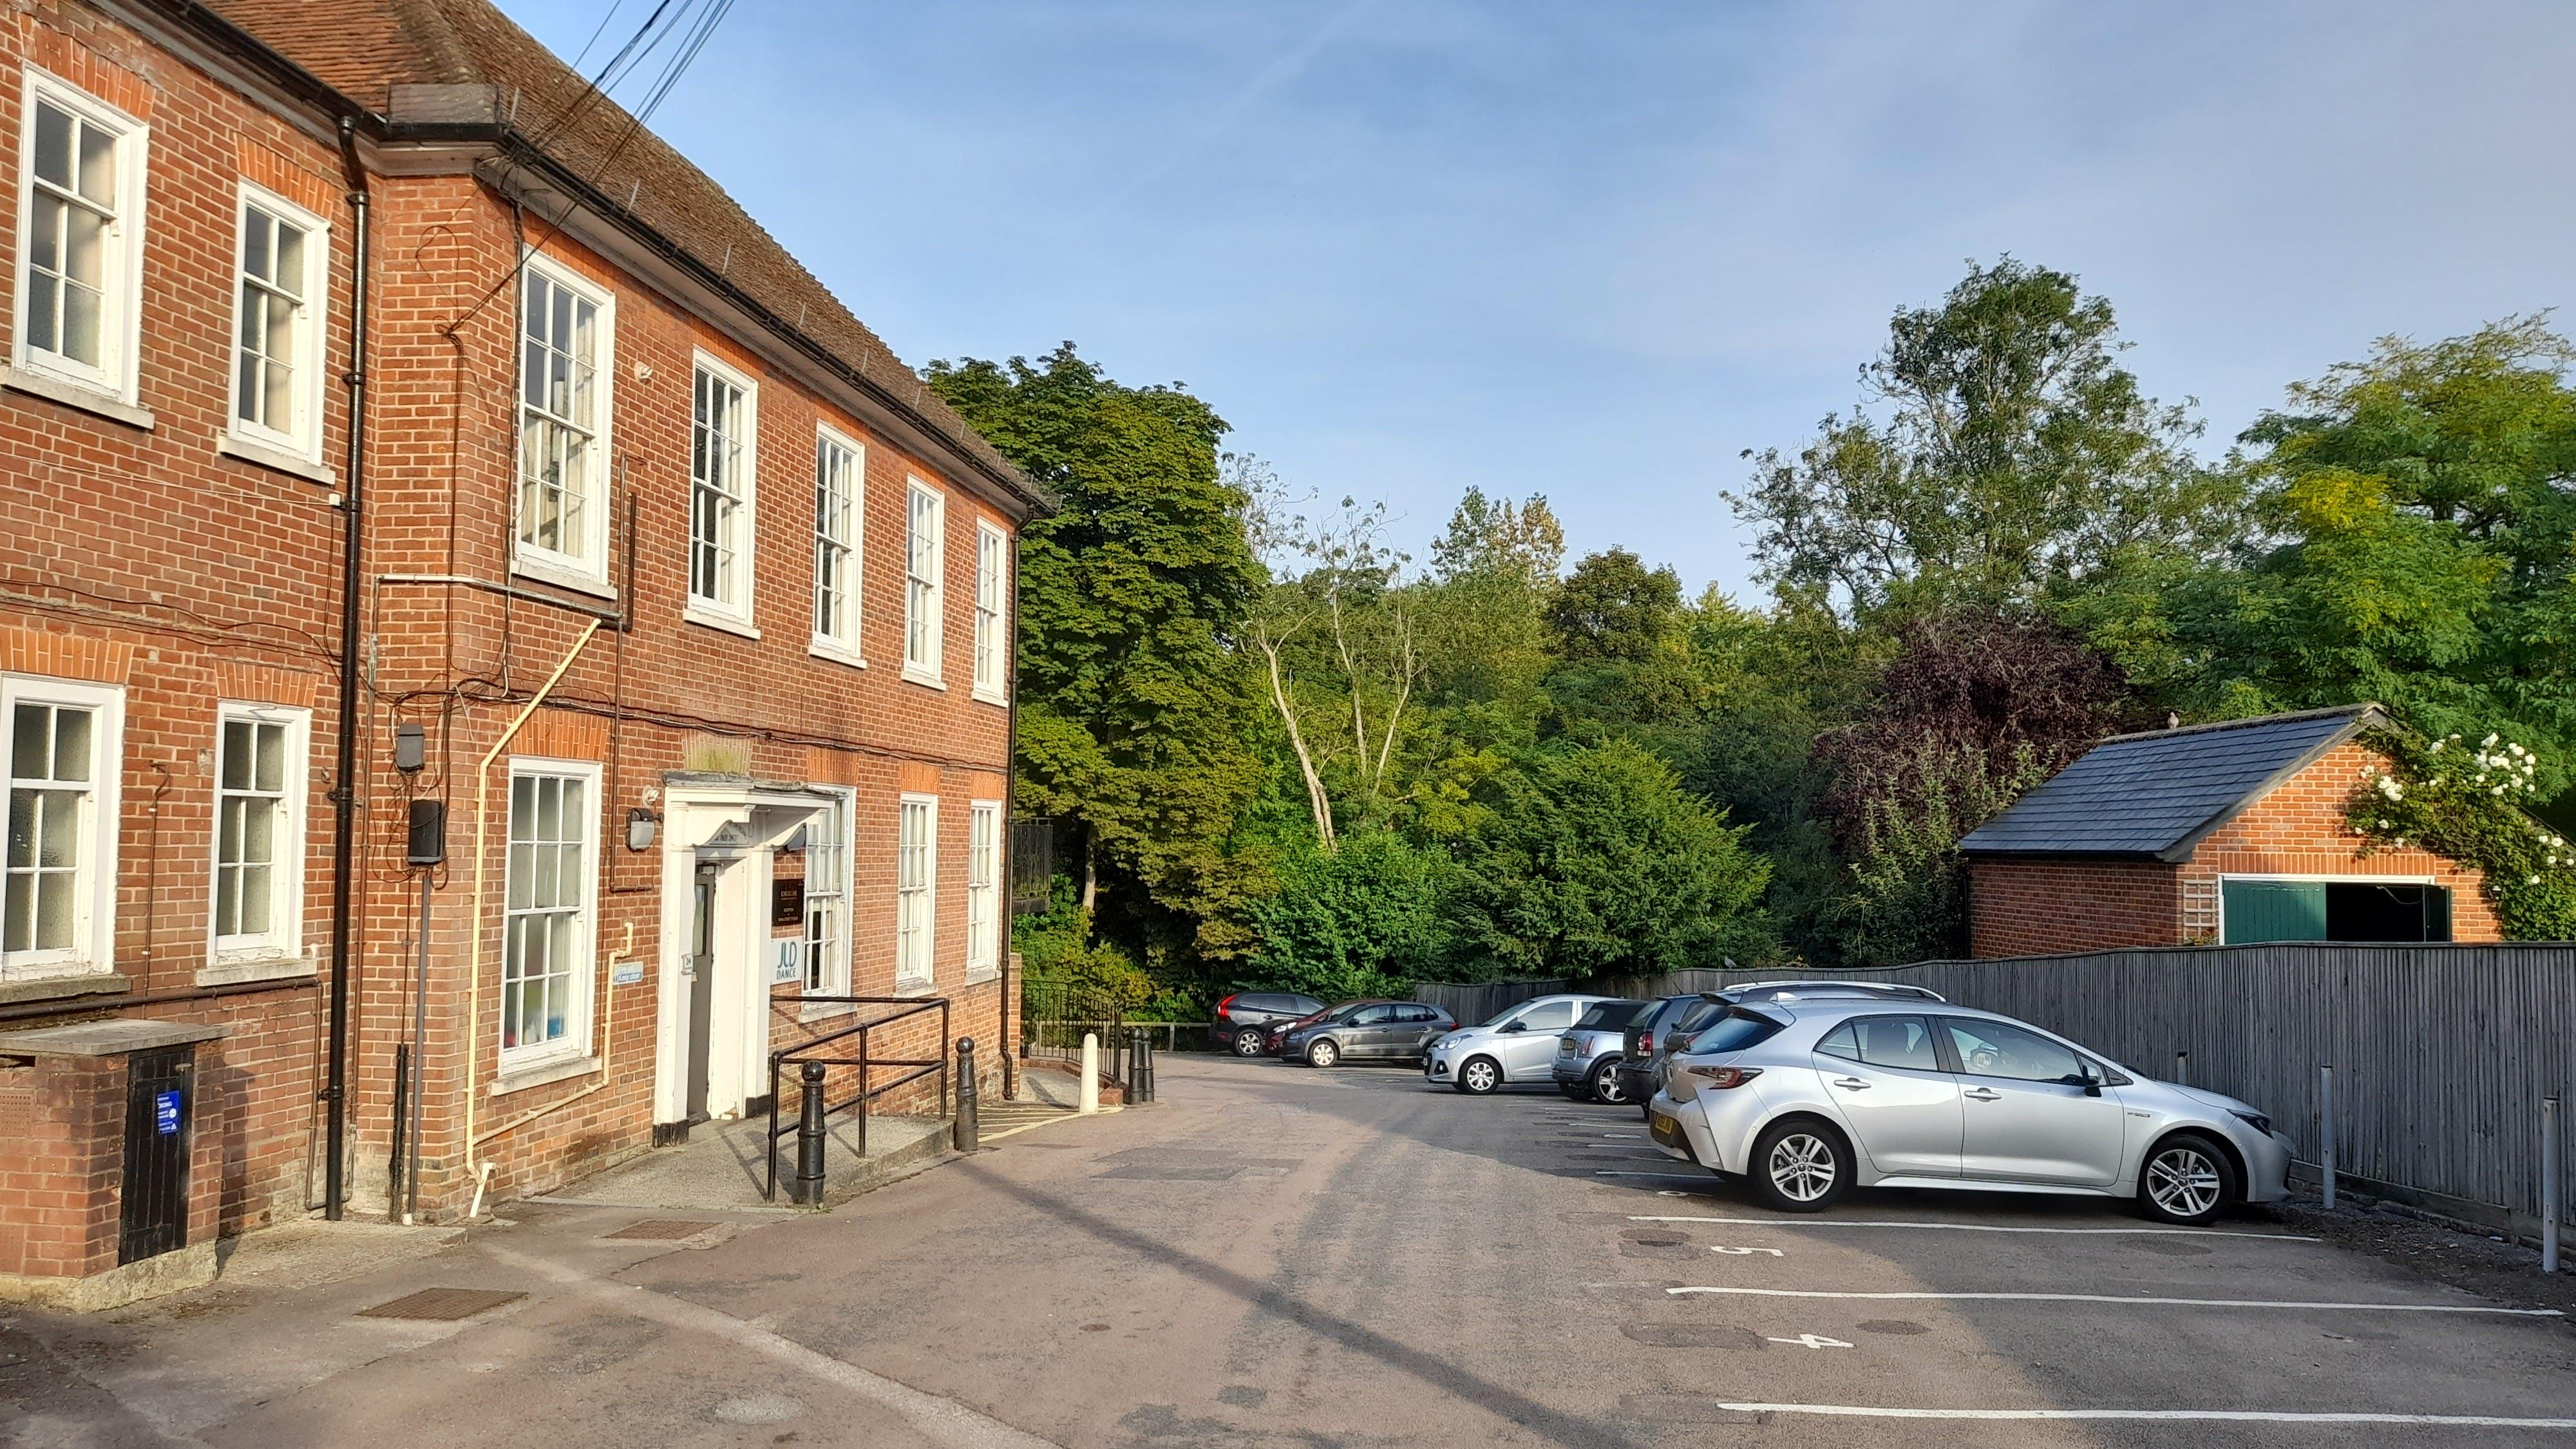 24 Swan Street Kingsclere, 24 Swan Street, Newbury, Development (Land & Buildings) / Investments / Offices For Sale - 20210906_082025.jpg